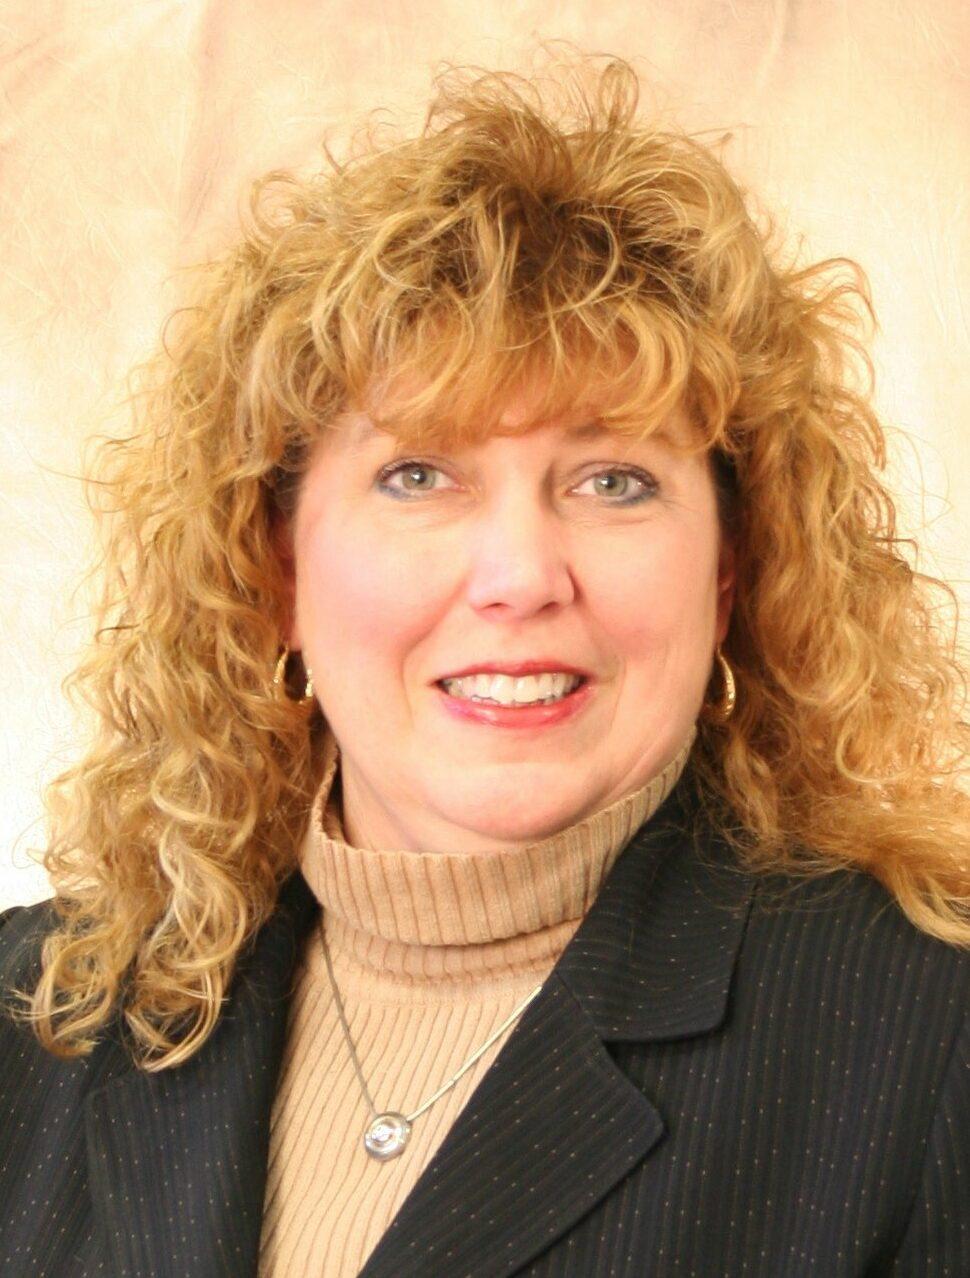 Image of Deborah Auspelmyer, Foundation Executive